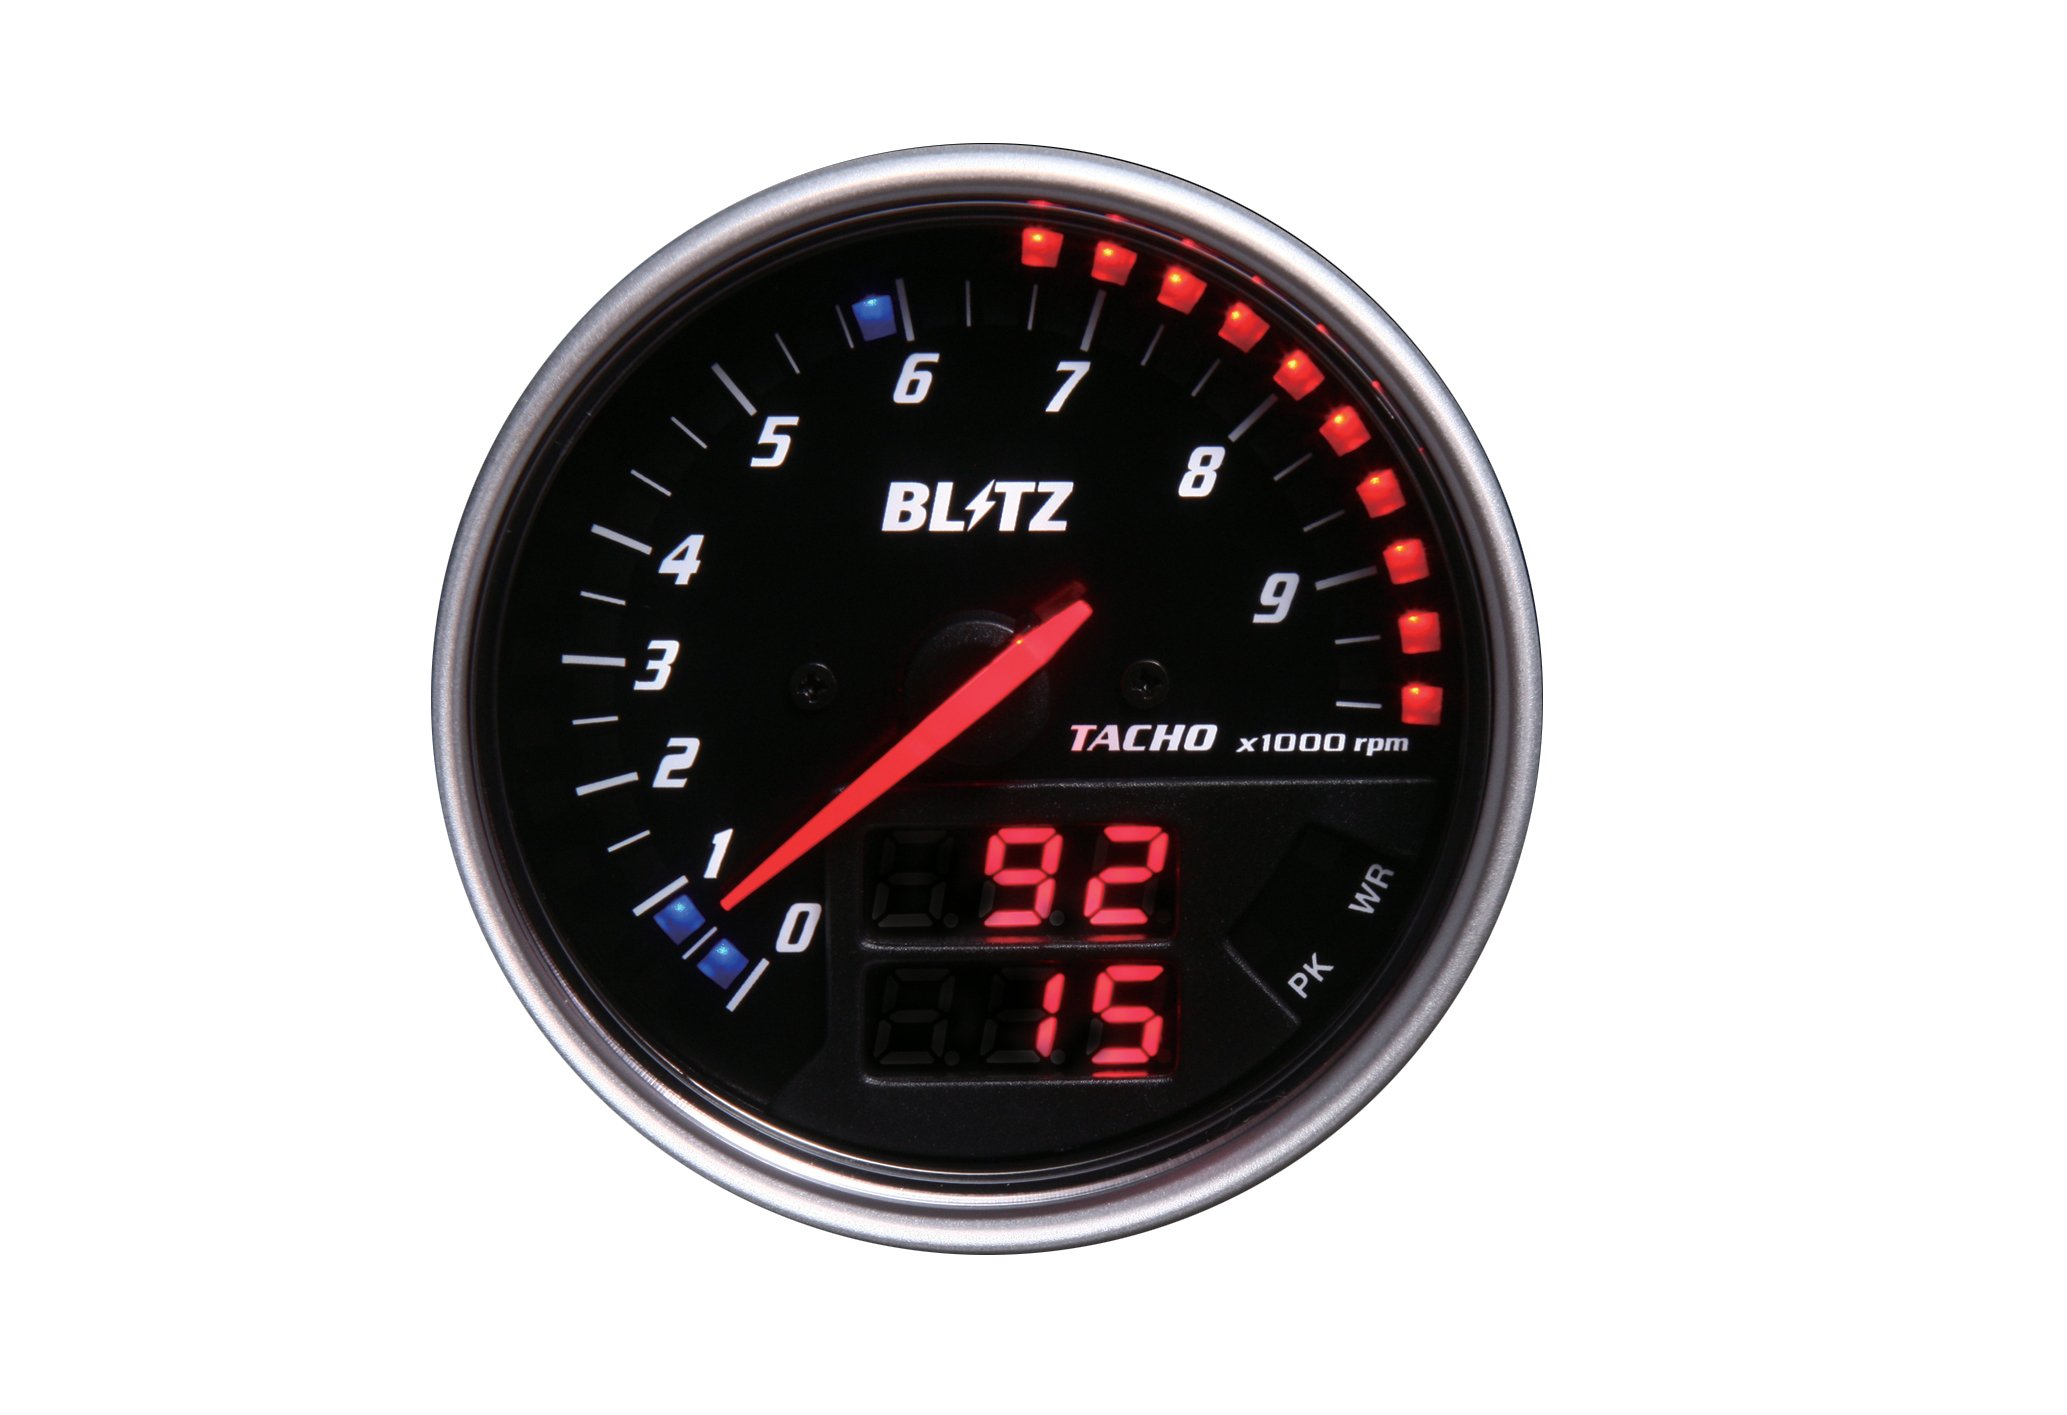 Blitz Fld Meter Tacho 15202 by Blitz (Image #1)